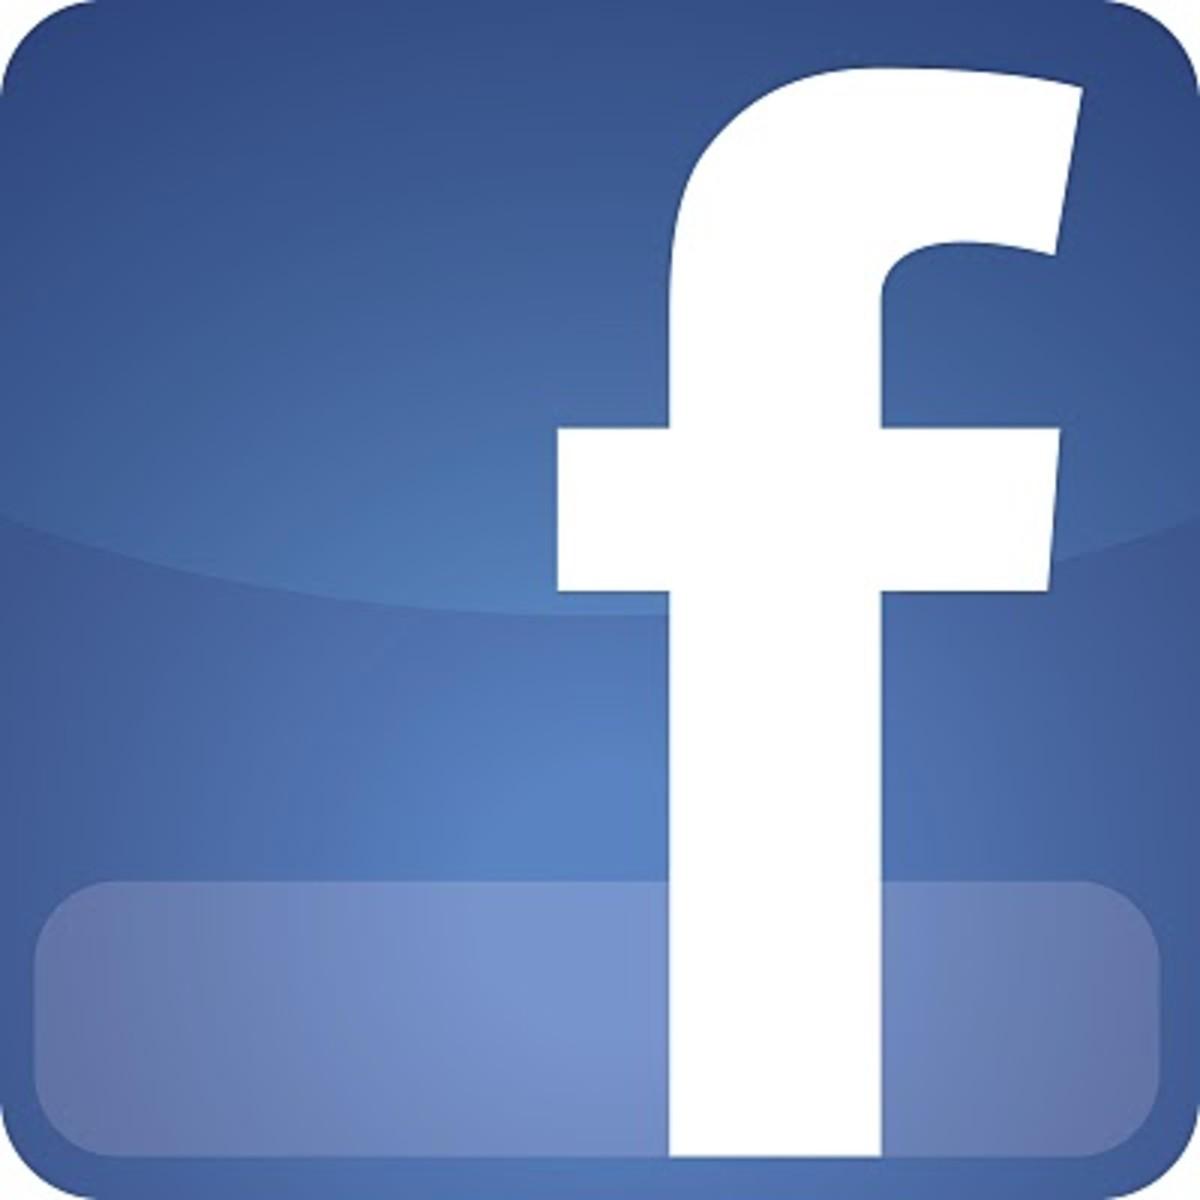 Utilize social media platforms to build reputation online